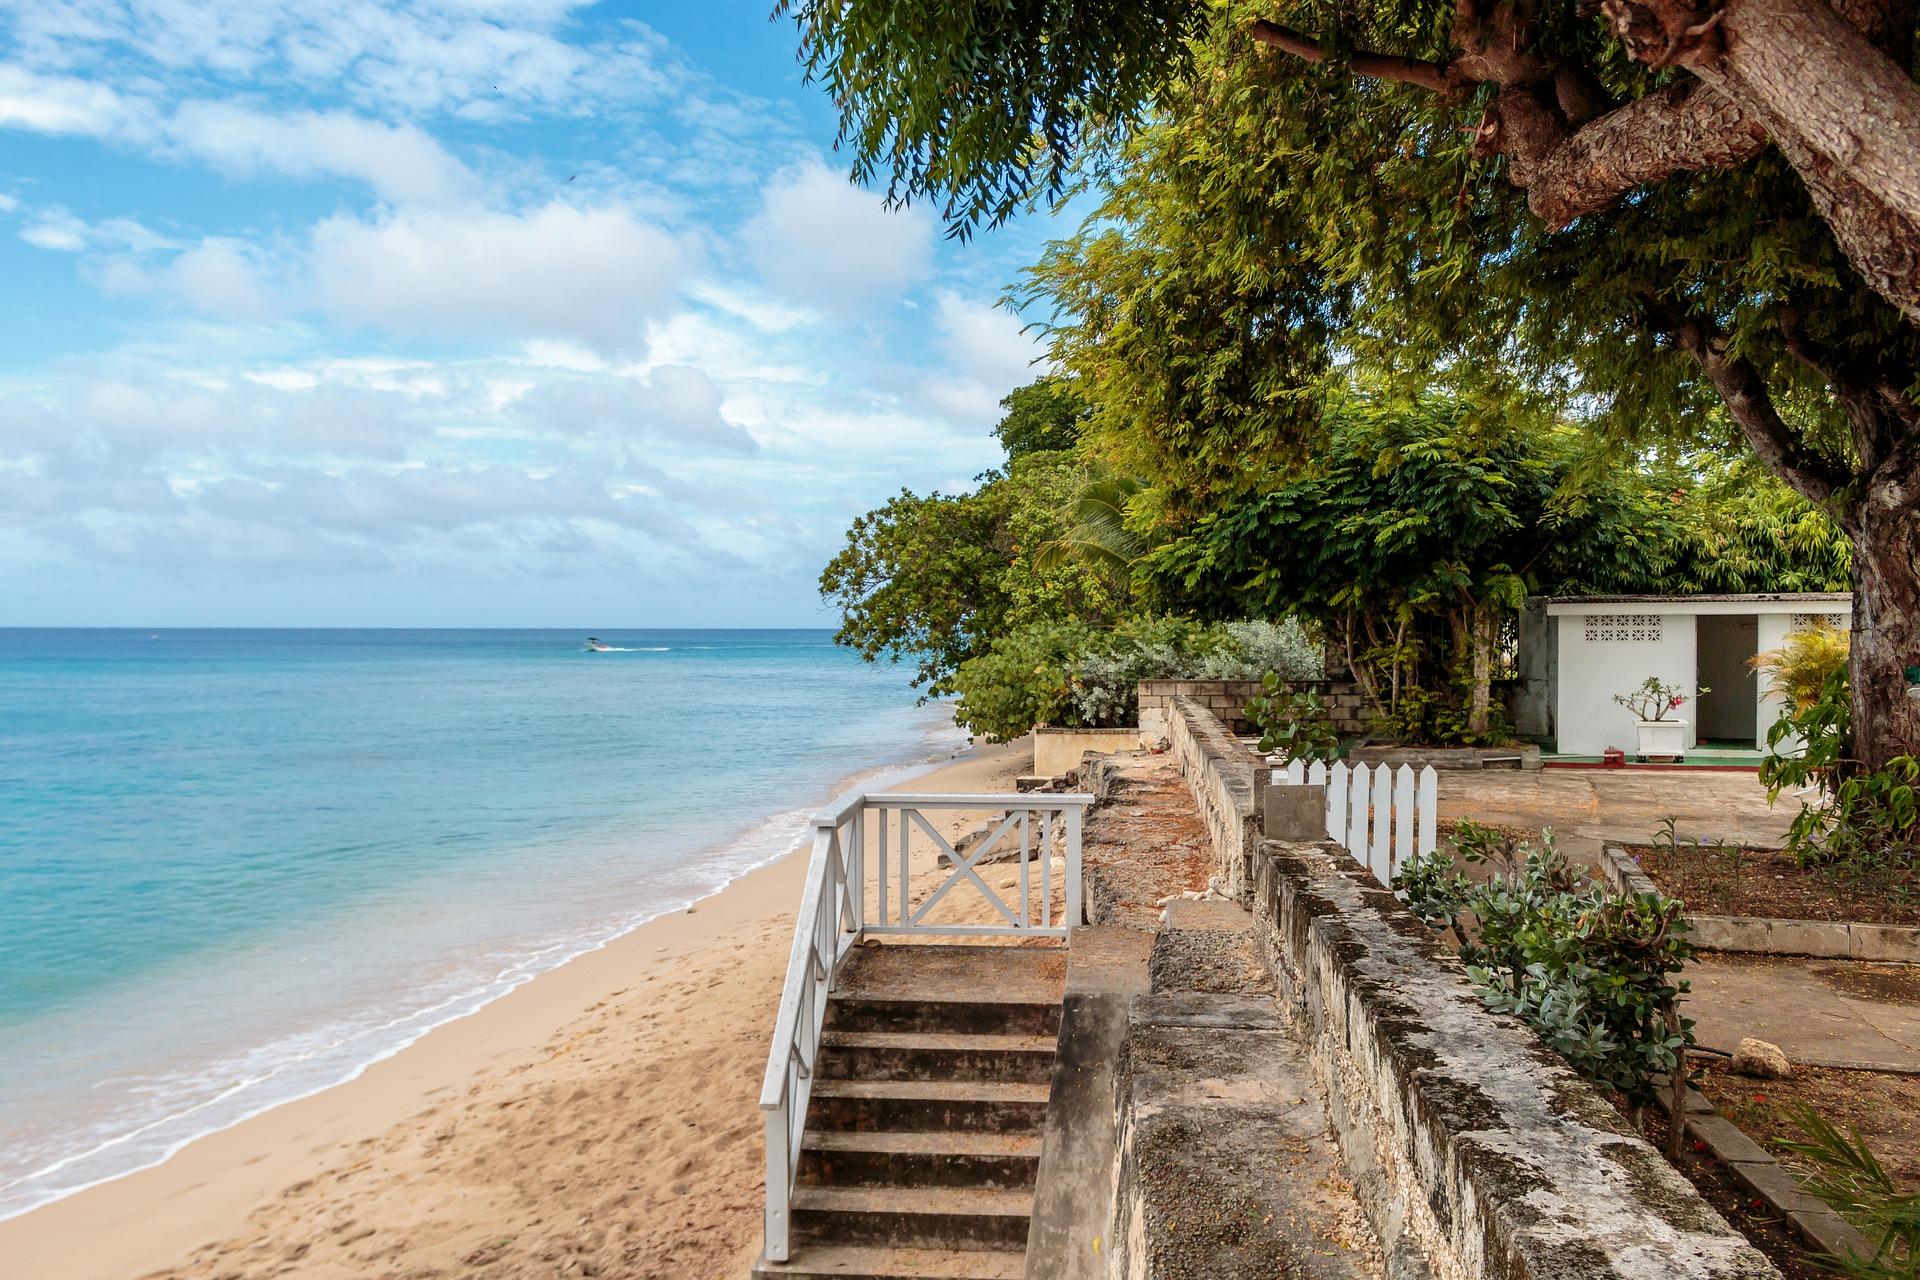 clearwater-villa-beach-1549544_1920